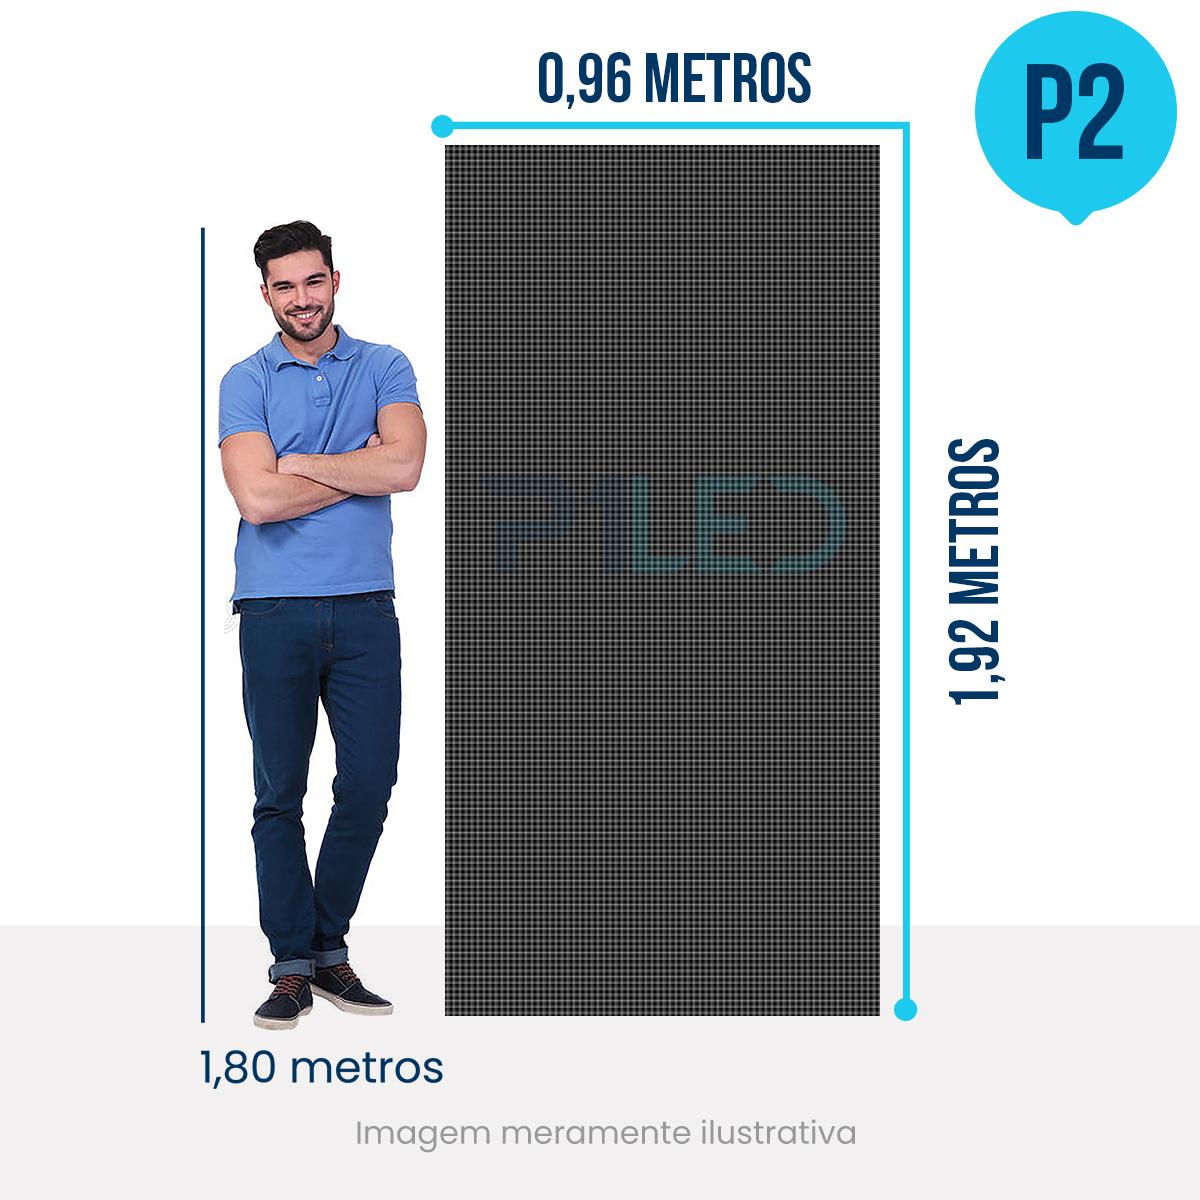 Painel de LED para Padaria 0,96 x 1,92 - Telão P2.9 Indoor  - Painel e Telão de LED - O Melhor Preço em Painel de LED   P1LED